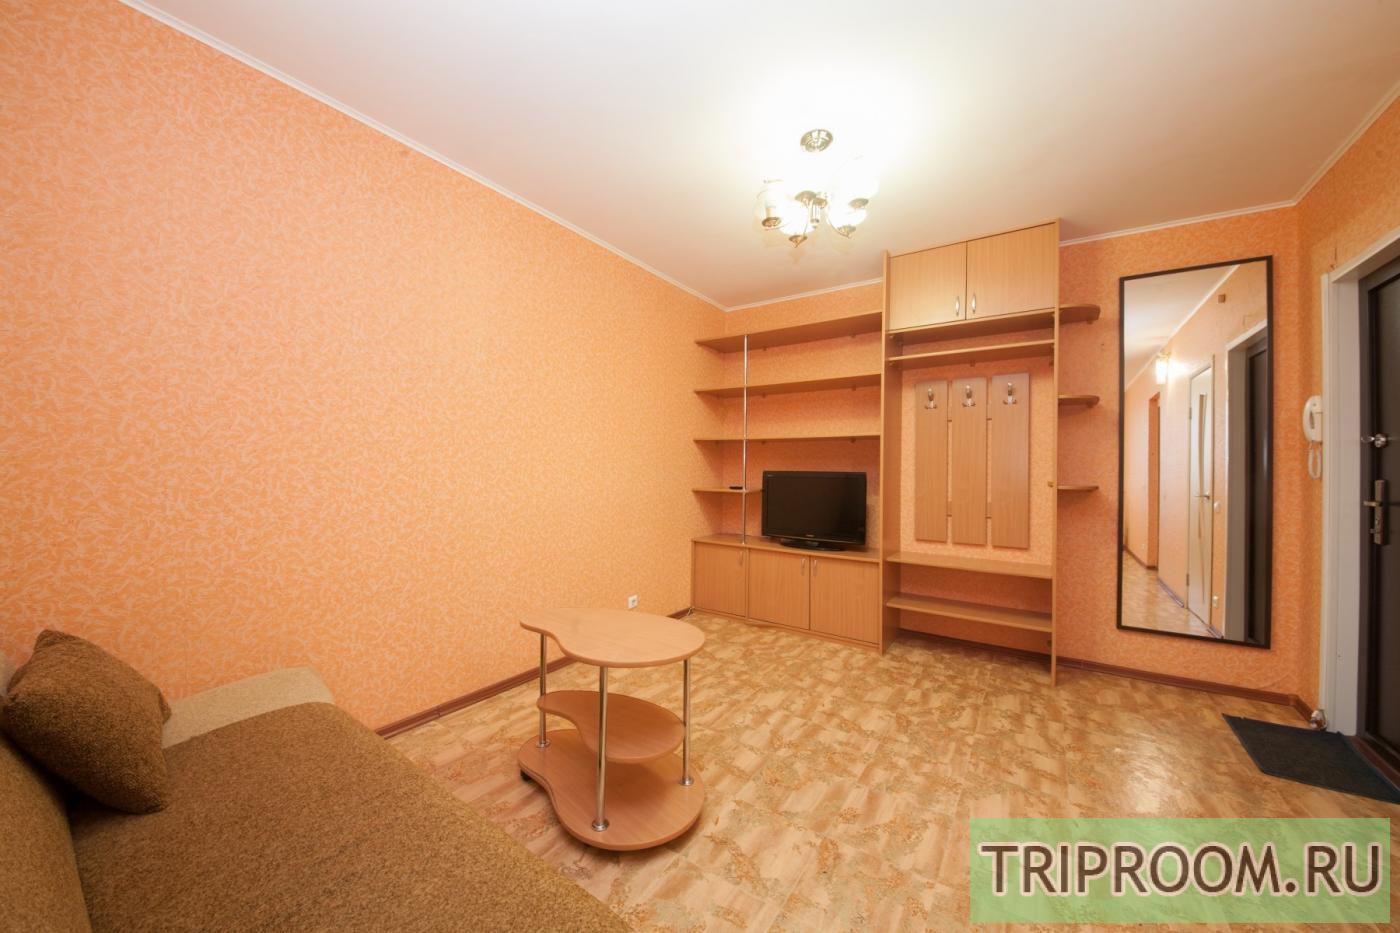 1-комнатная квартира посуточно (вариант № 35185), ул. Алексеева улица, фото № 4